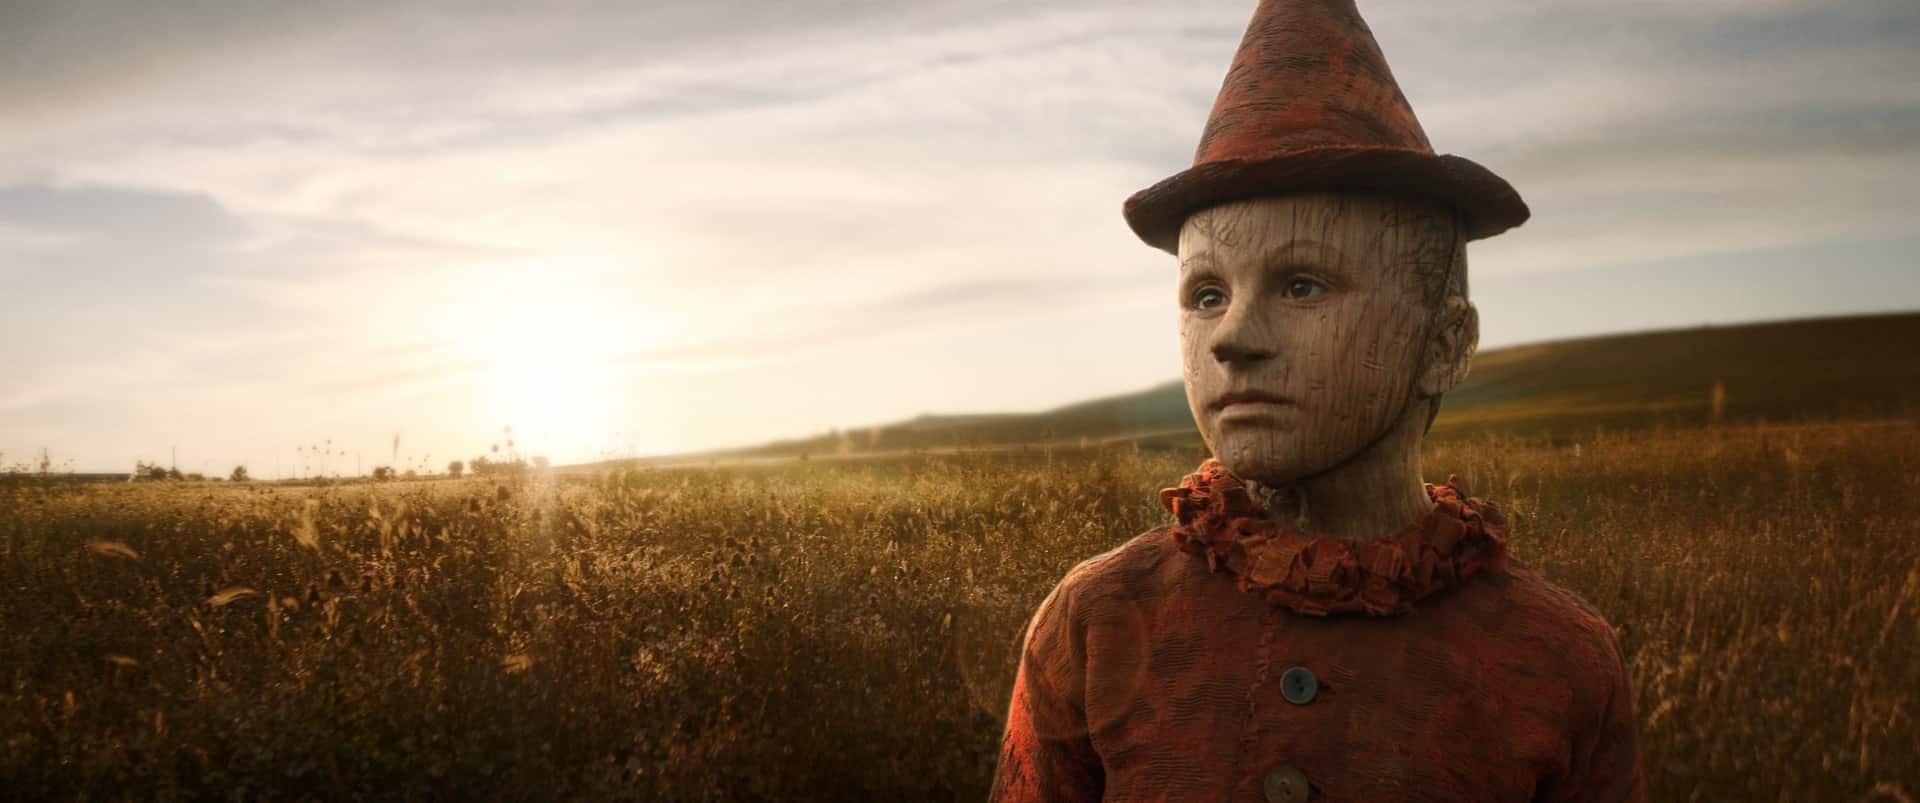 Pinocchio Cinematographe